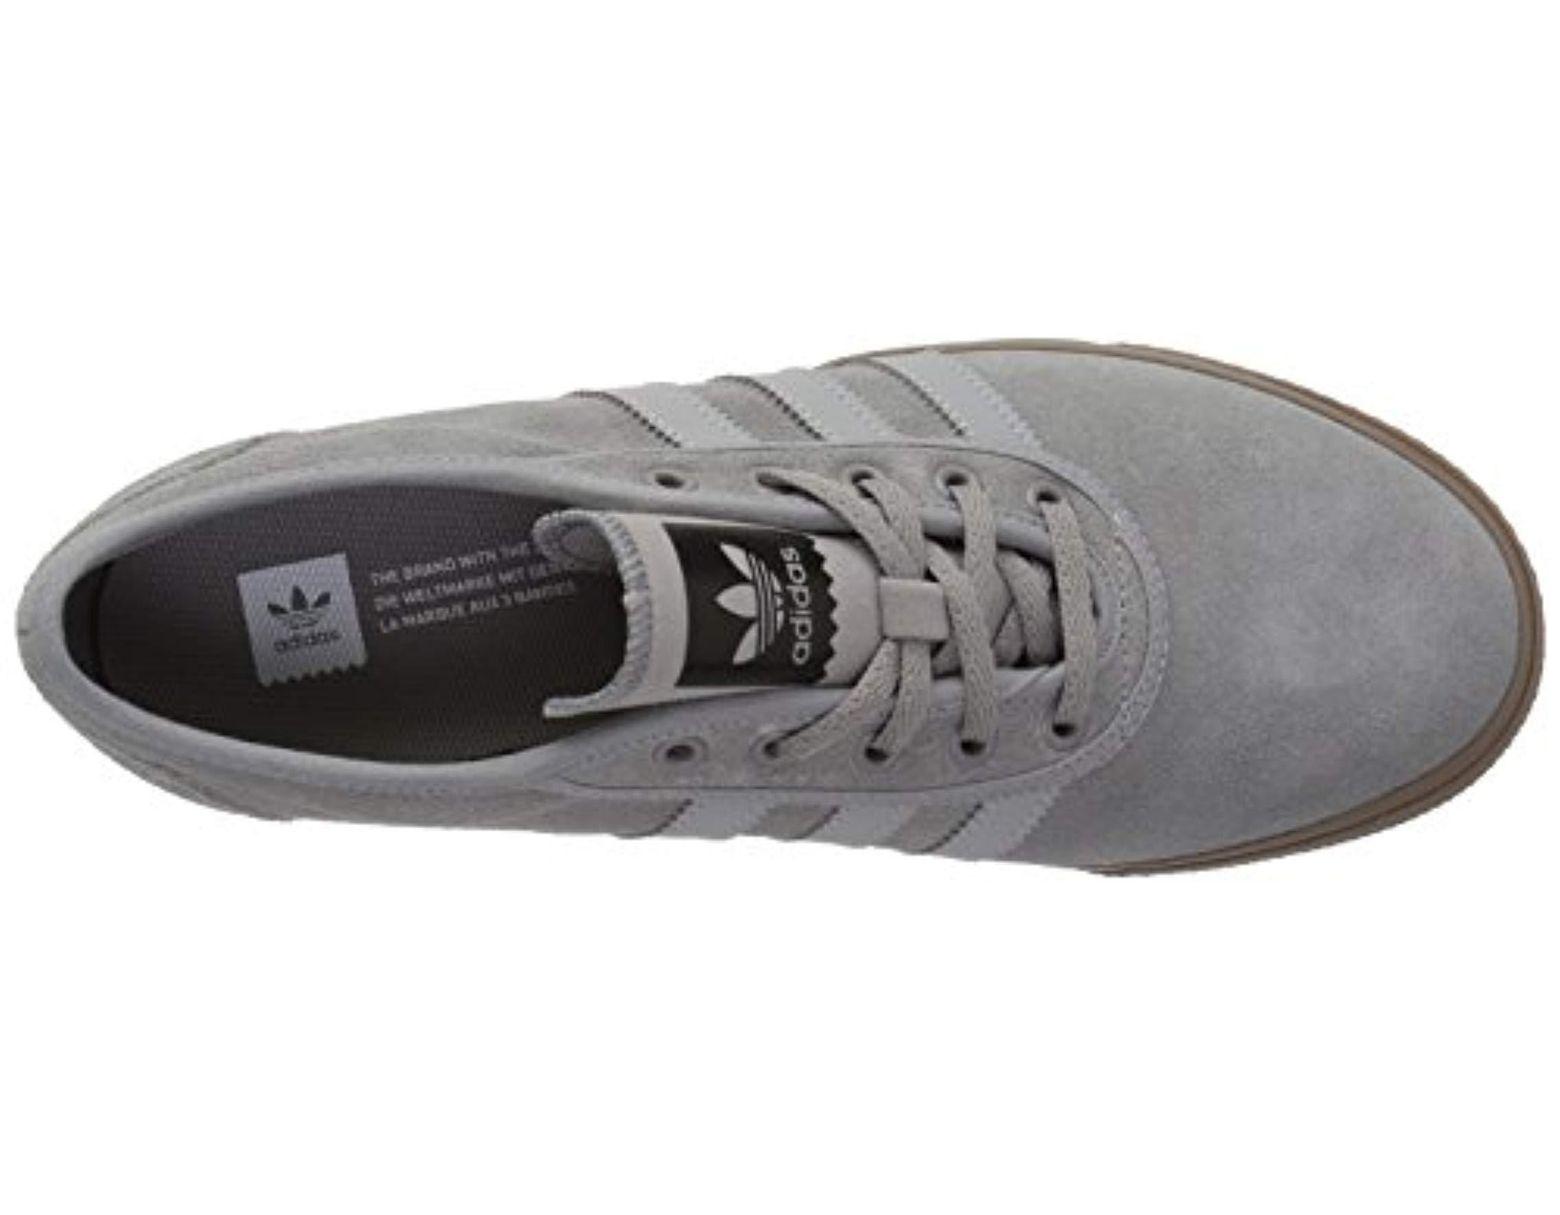 Adidas Gray ShoeSolid Greygum7 Skate Adi Ease M In Us Originals oQrdWCexB